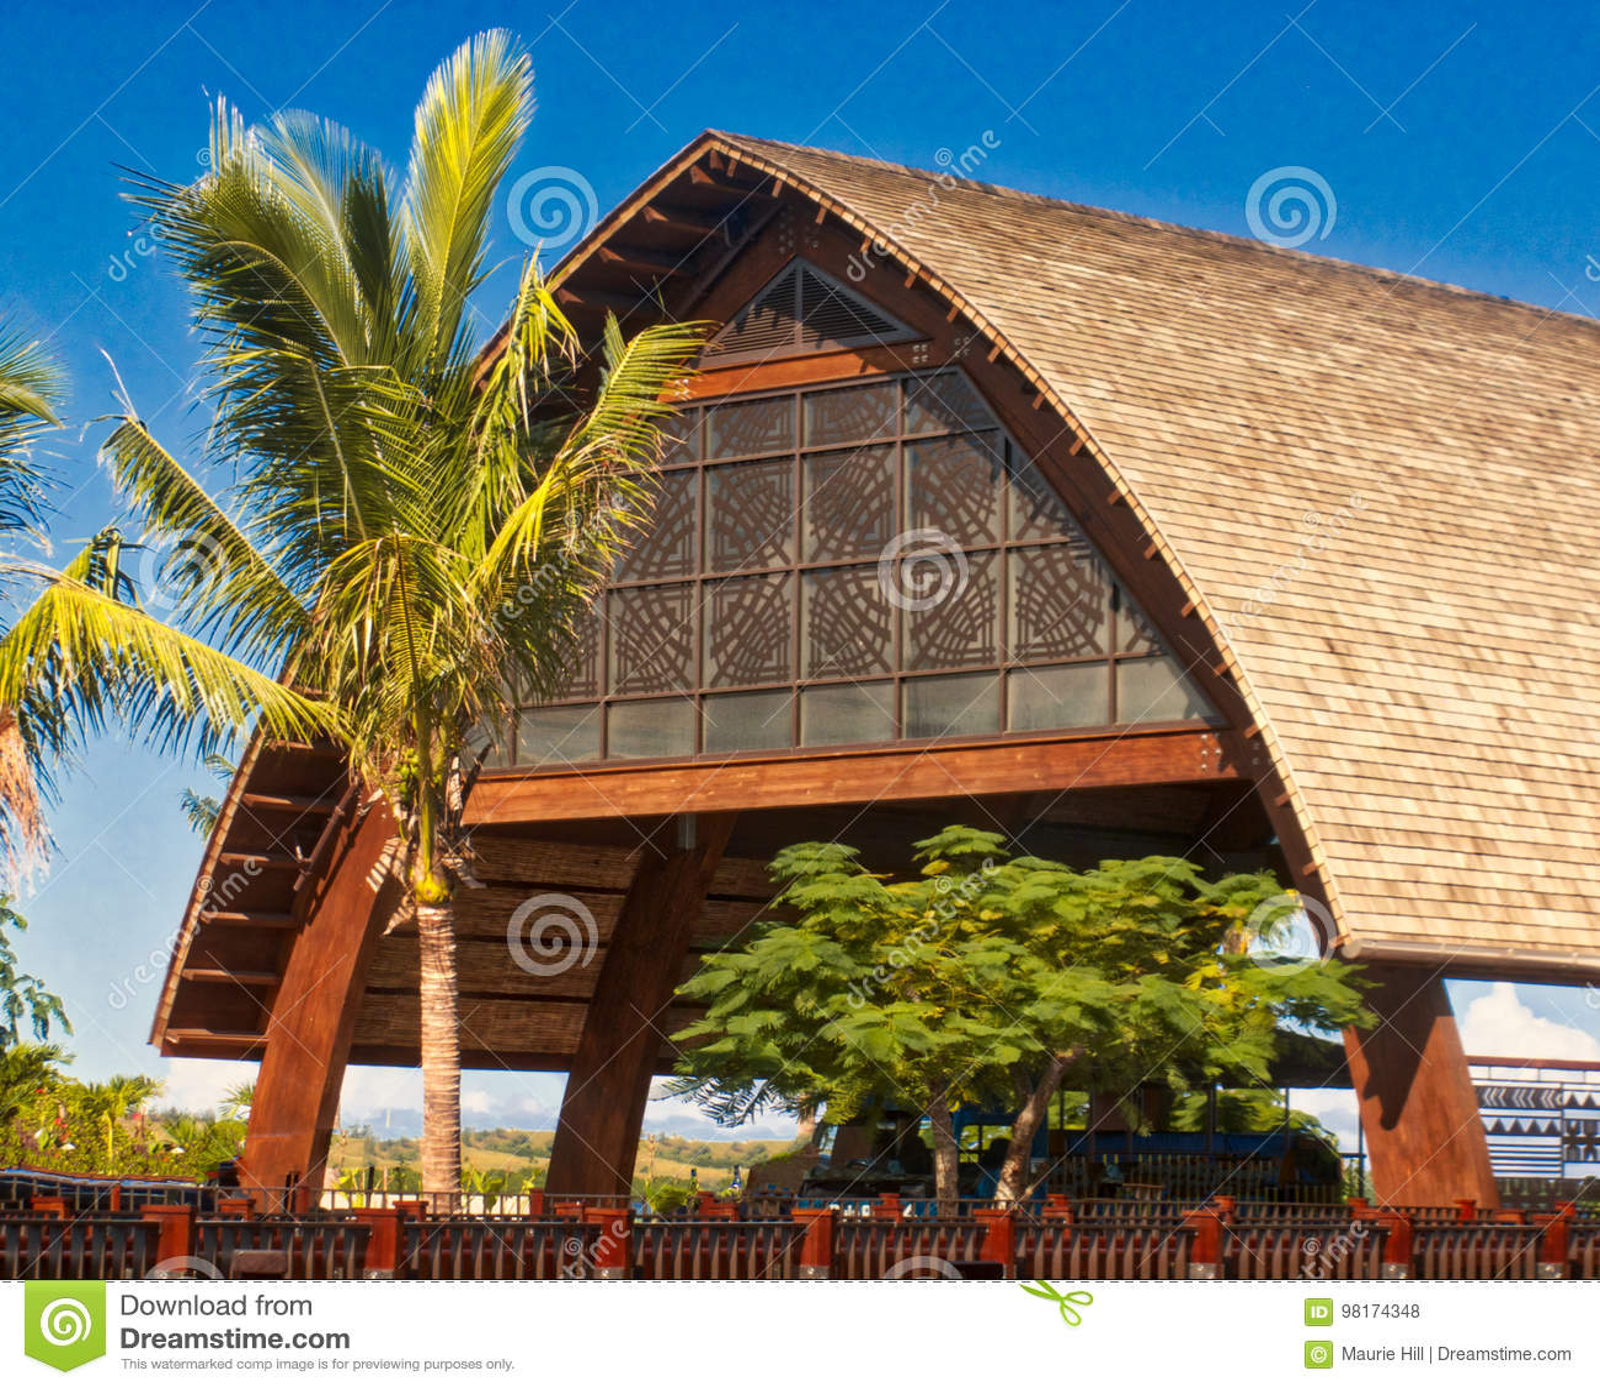 Fijian Architecture At Momi Resort Editorial Stock Photo Image Of